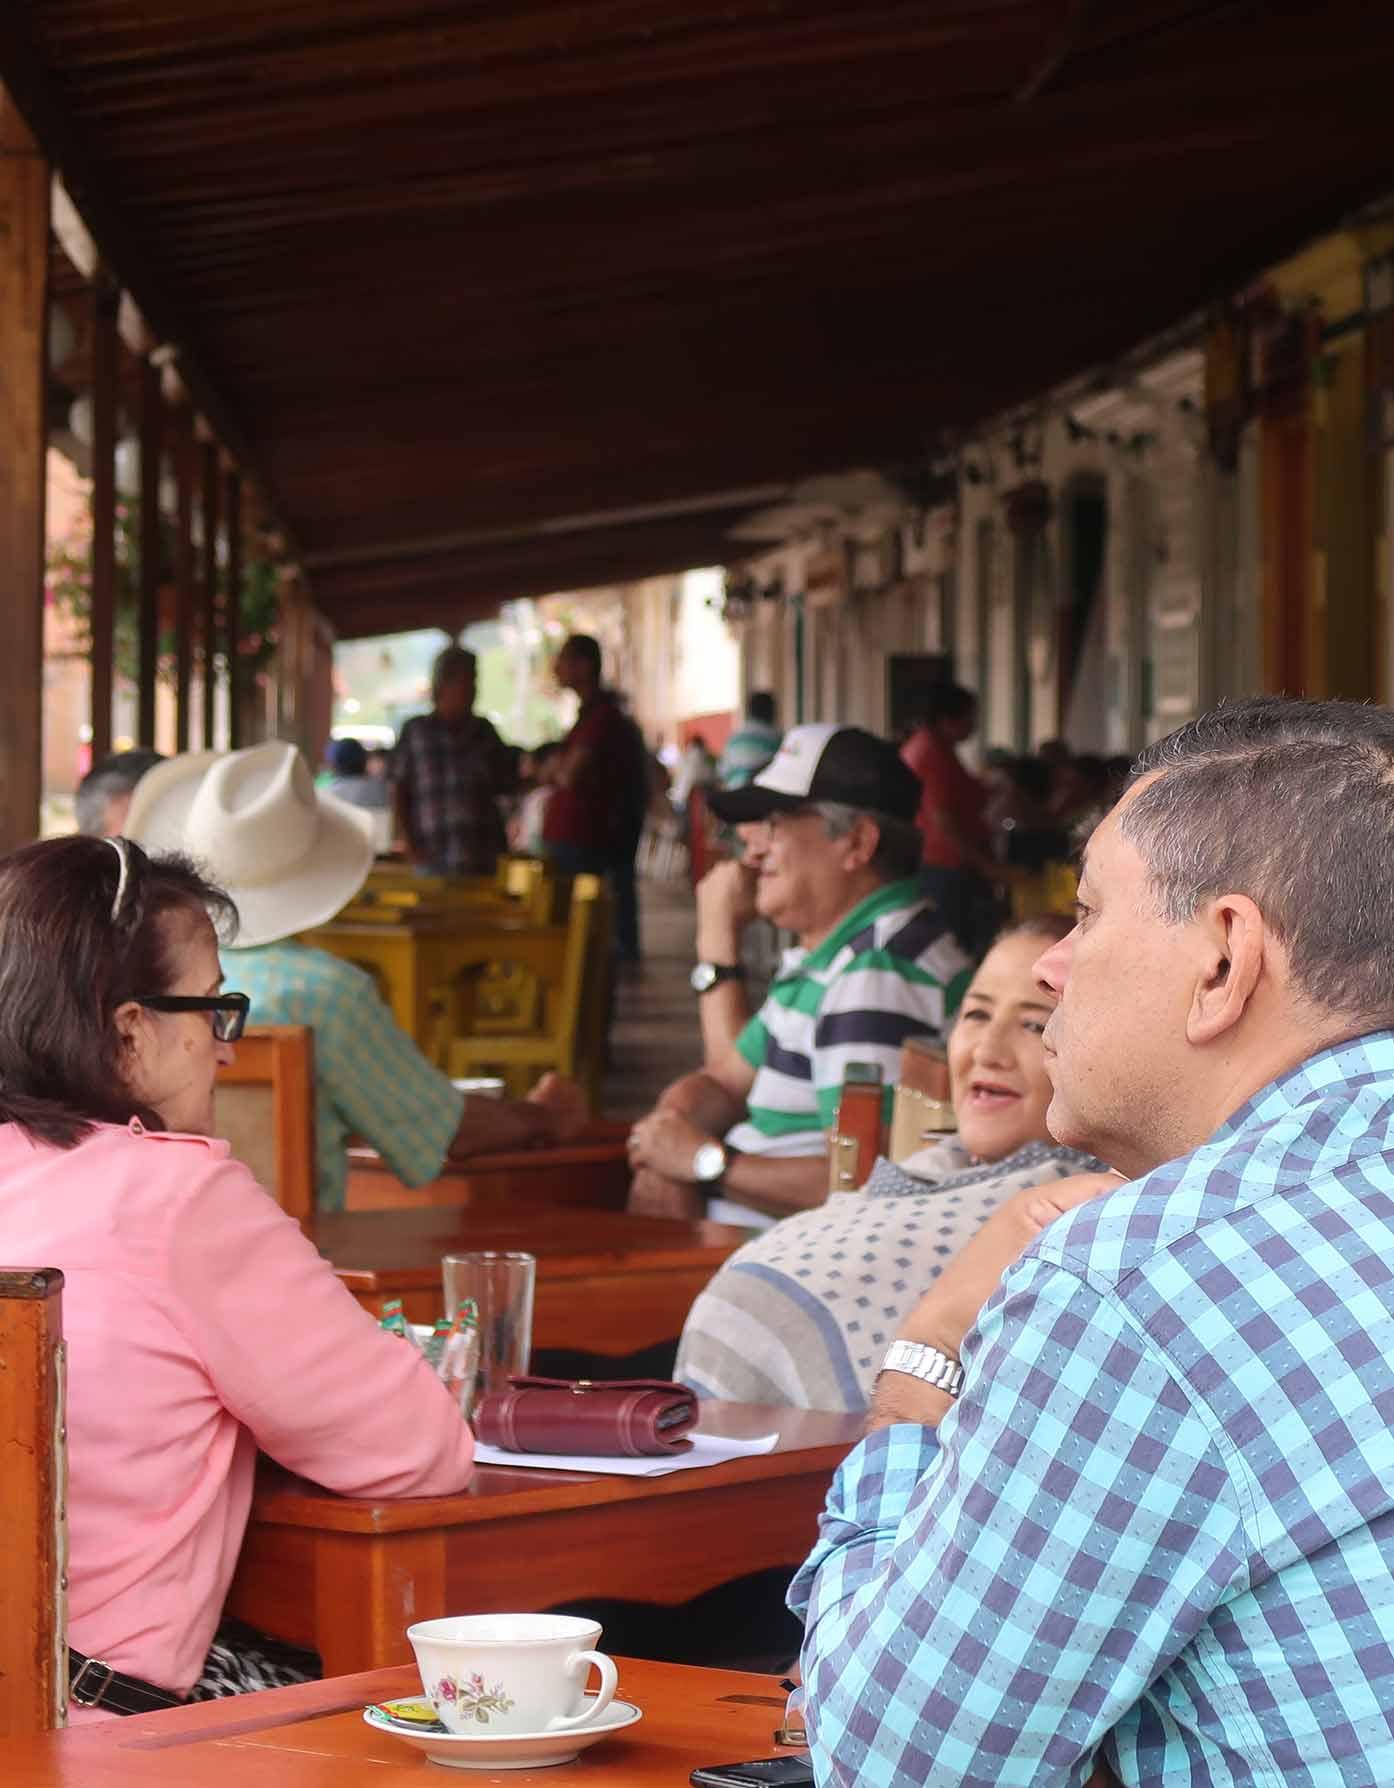 colombian people